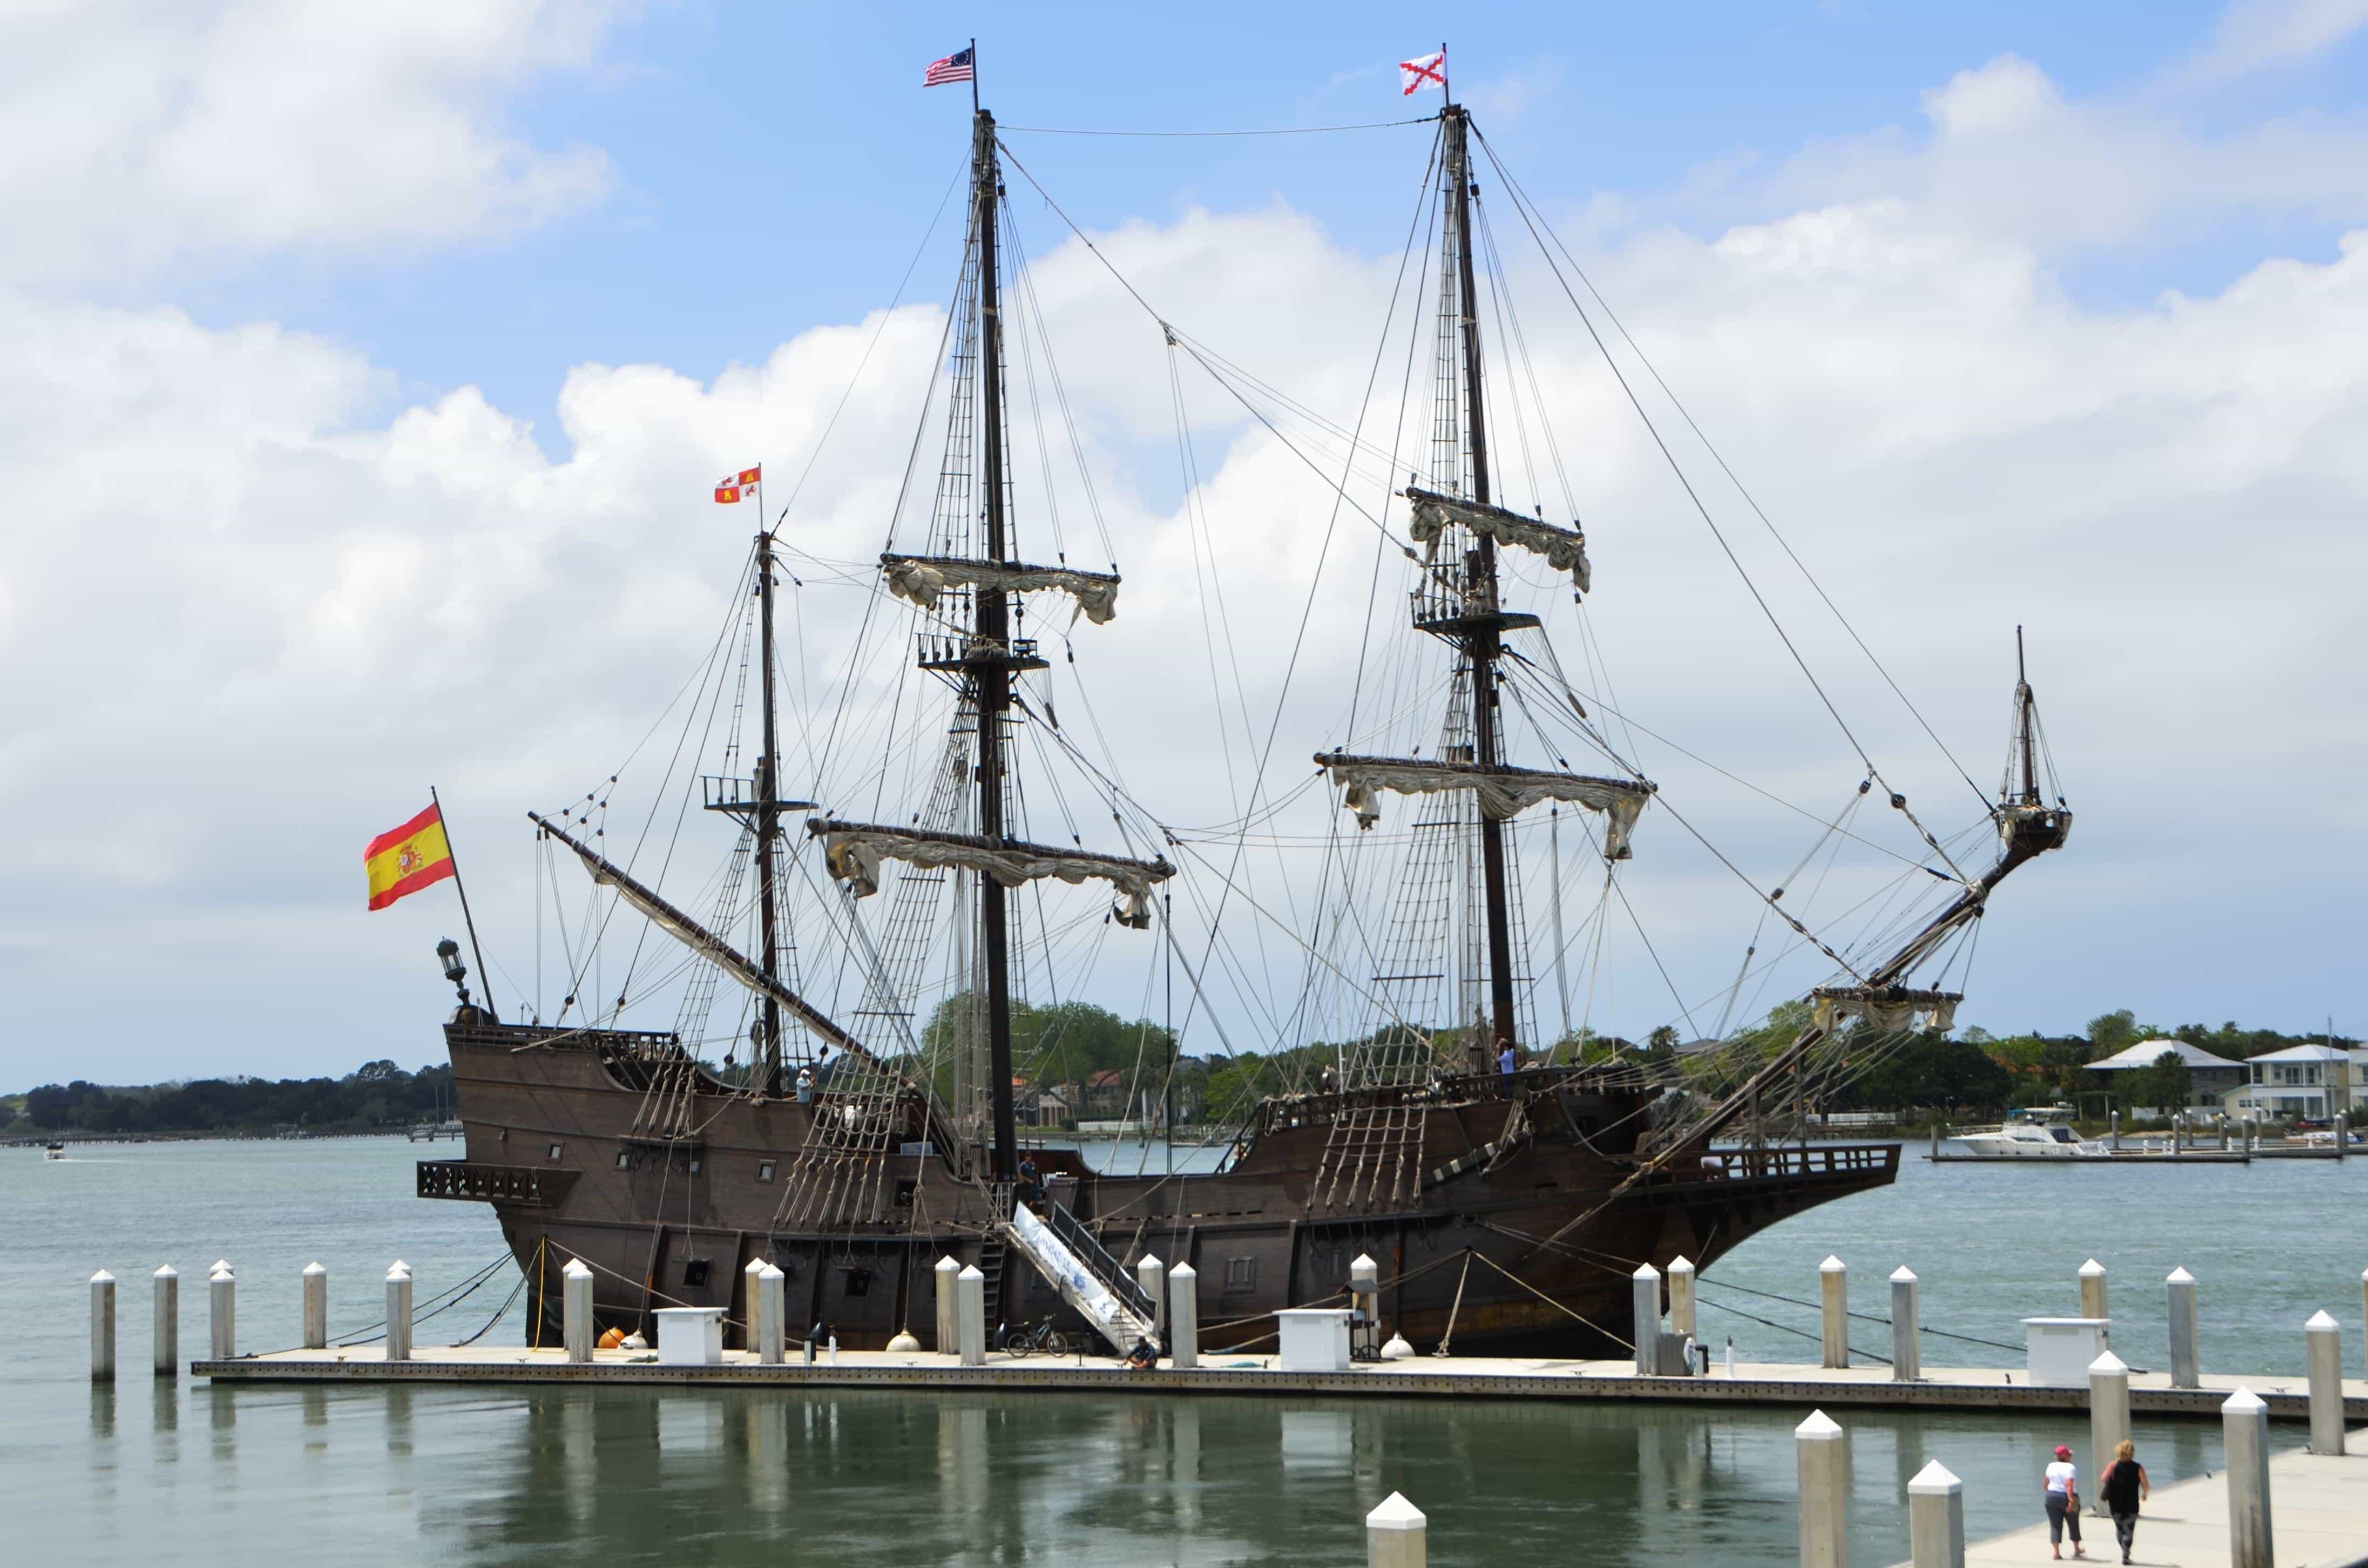 Image Libre Eau Embarcation Navire Vieux Navire